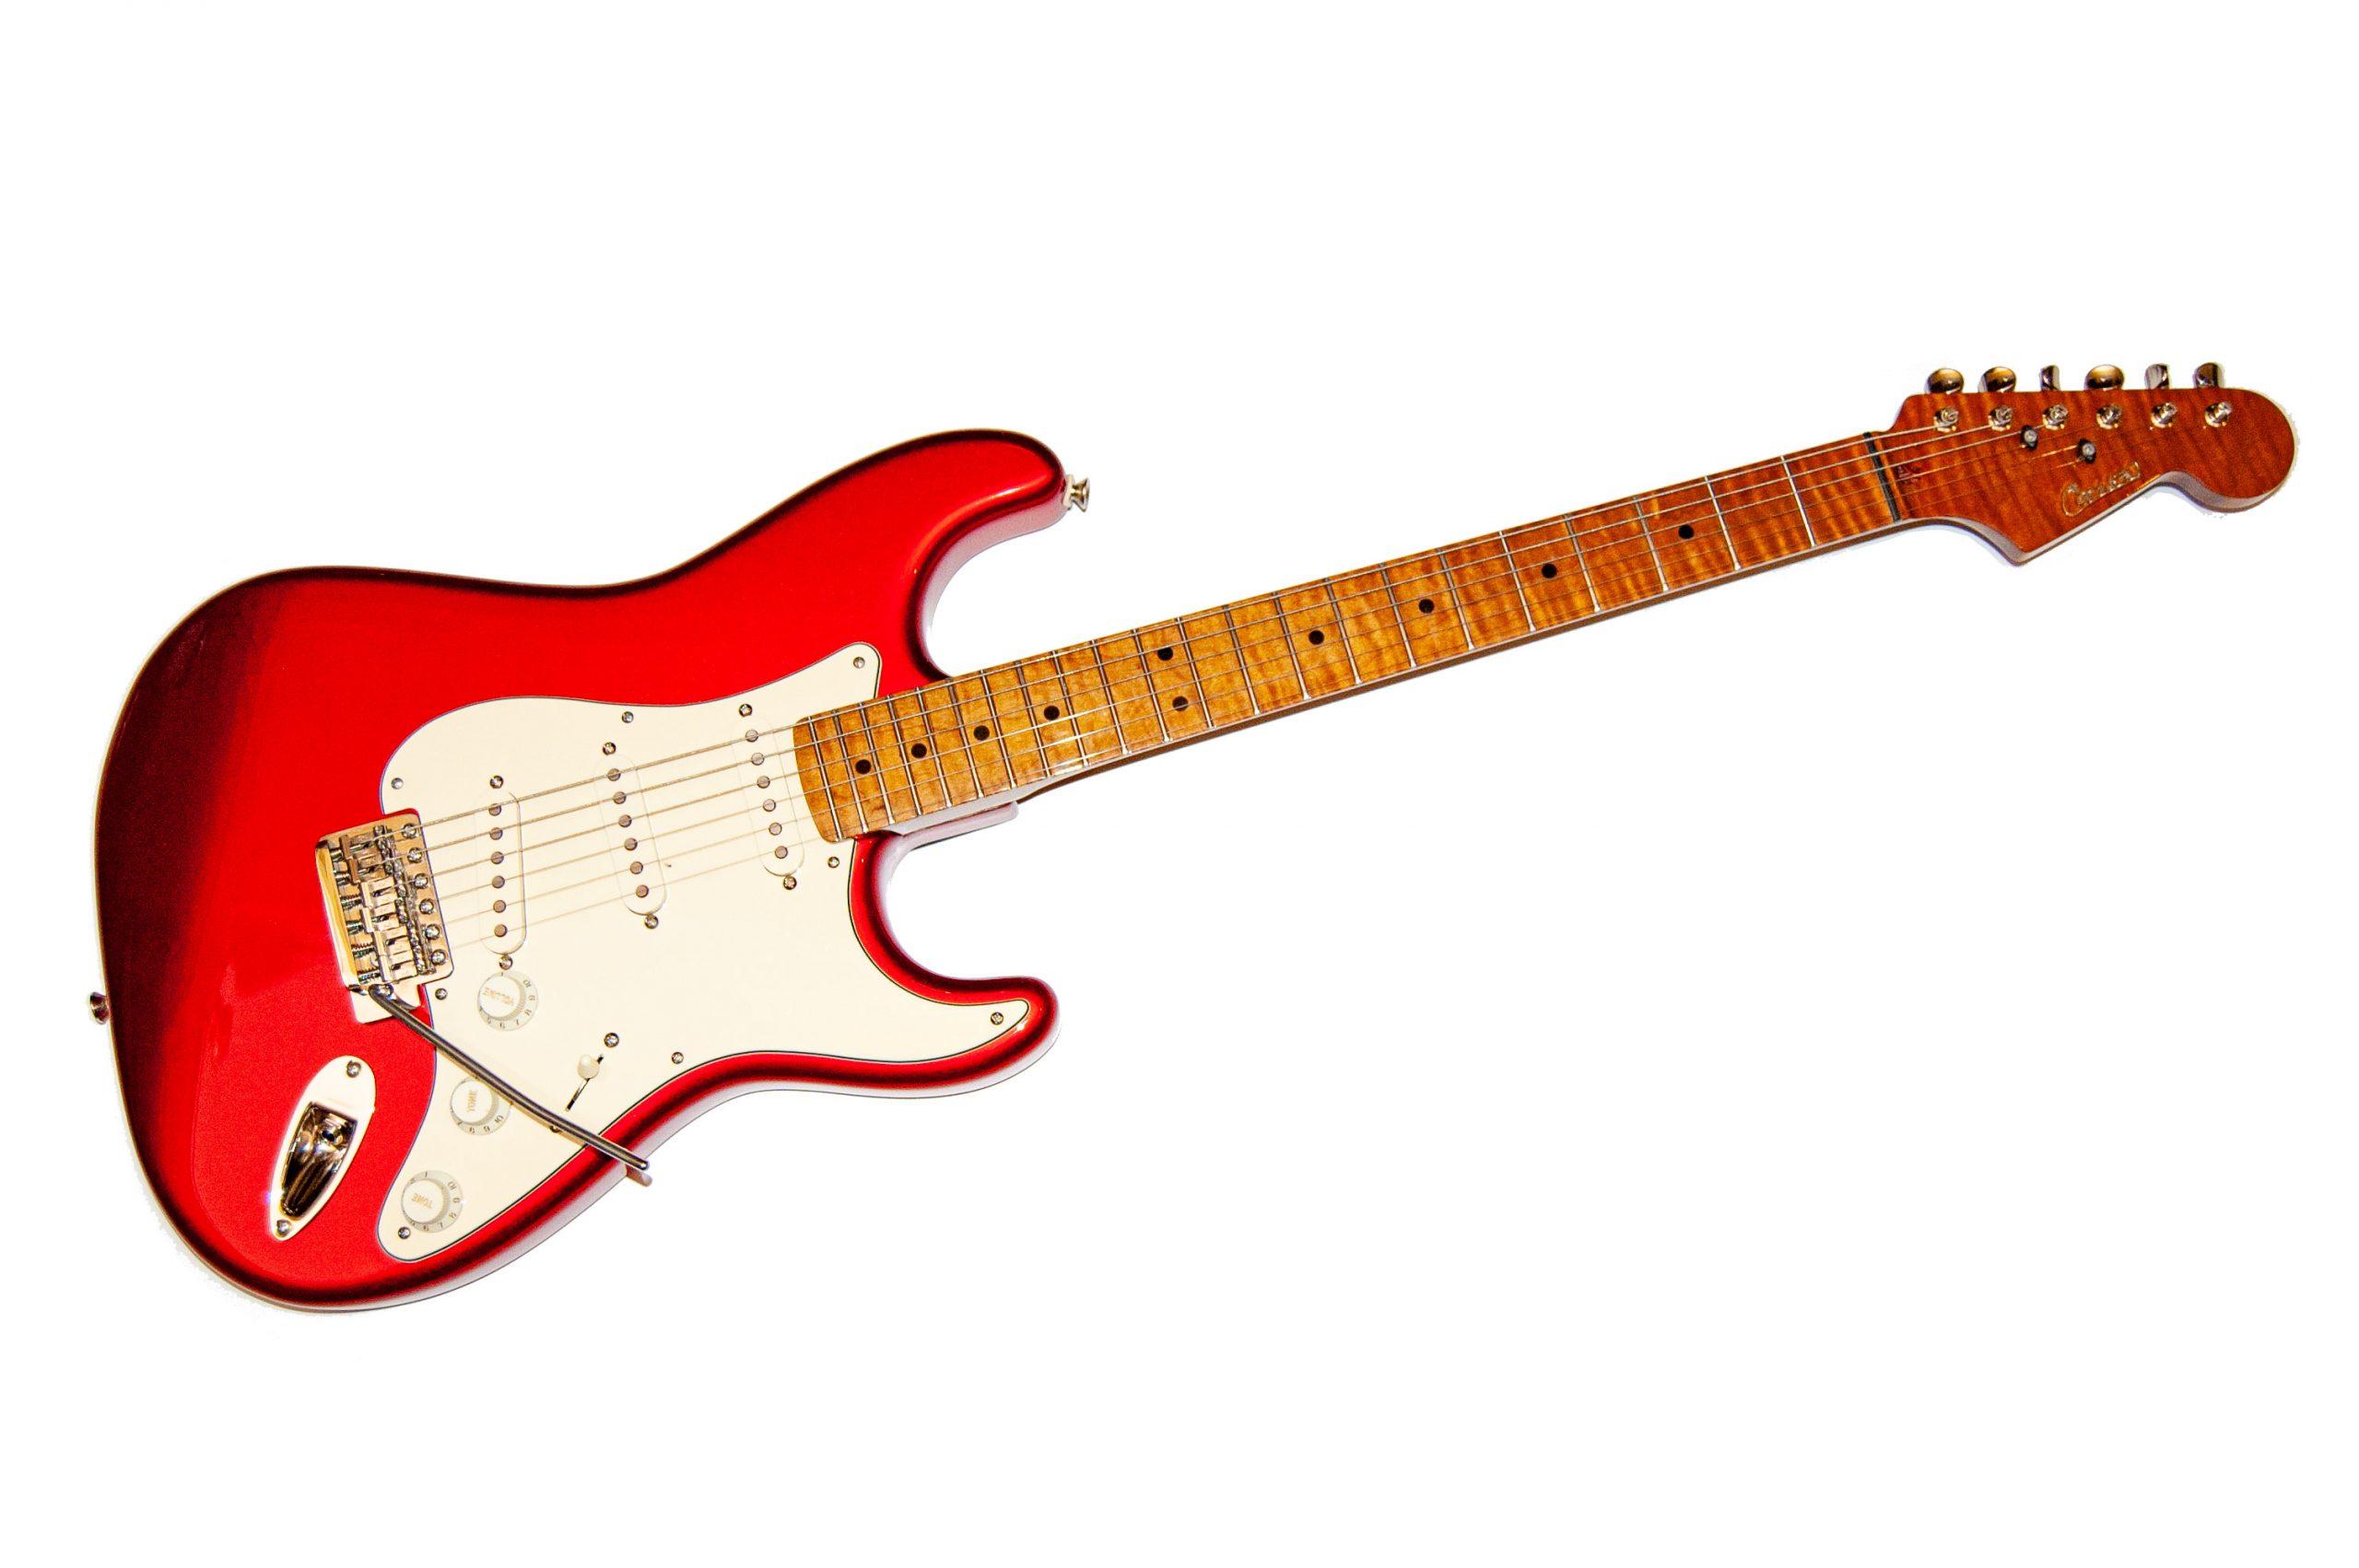 CST Caruso Strat Stile Guitars